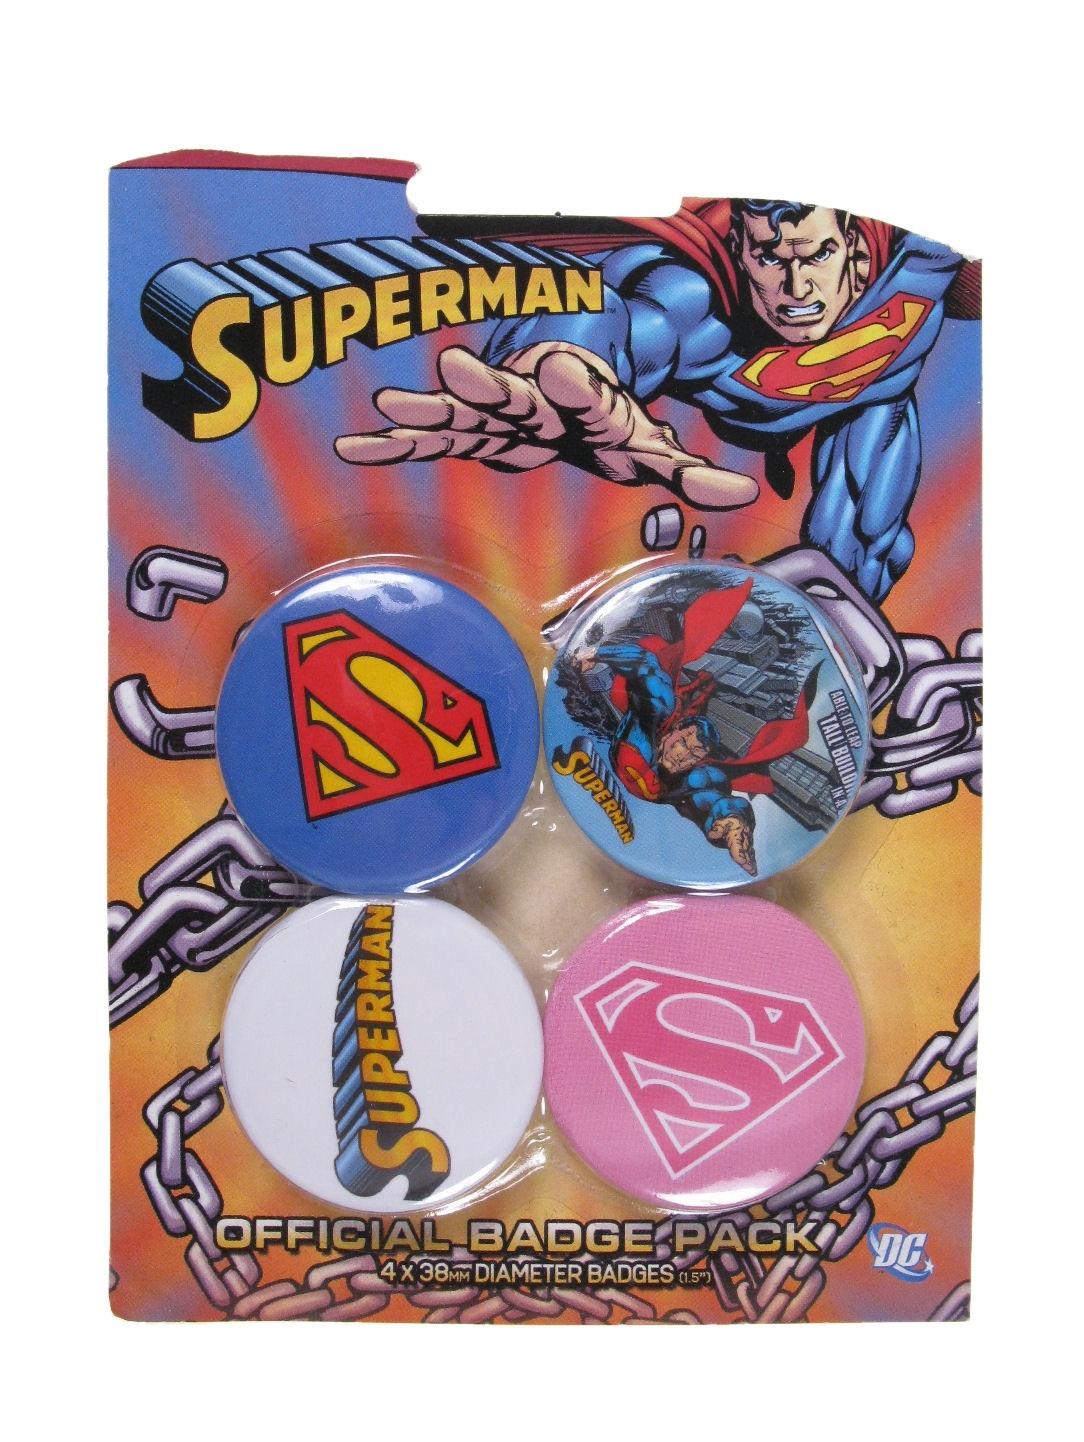 placky Superman - BP80108 - Pyramid Posters